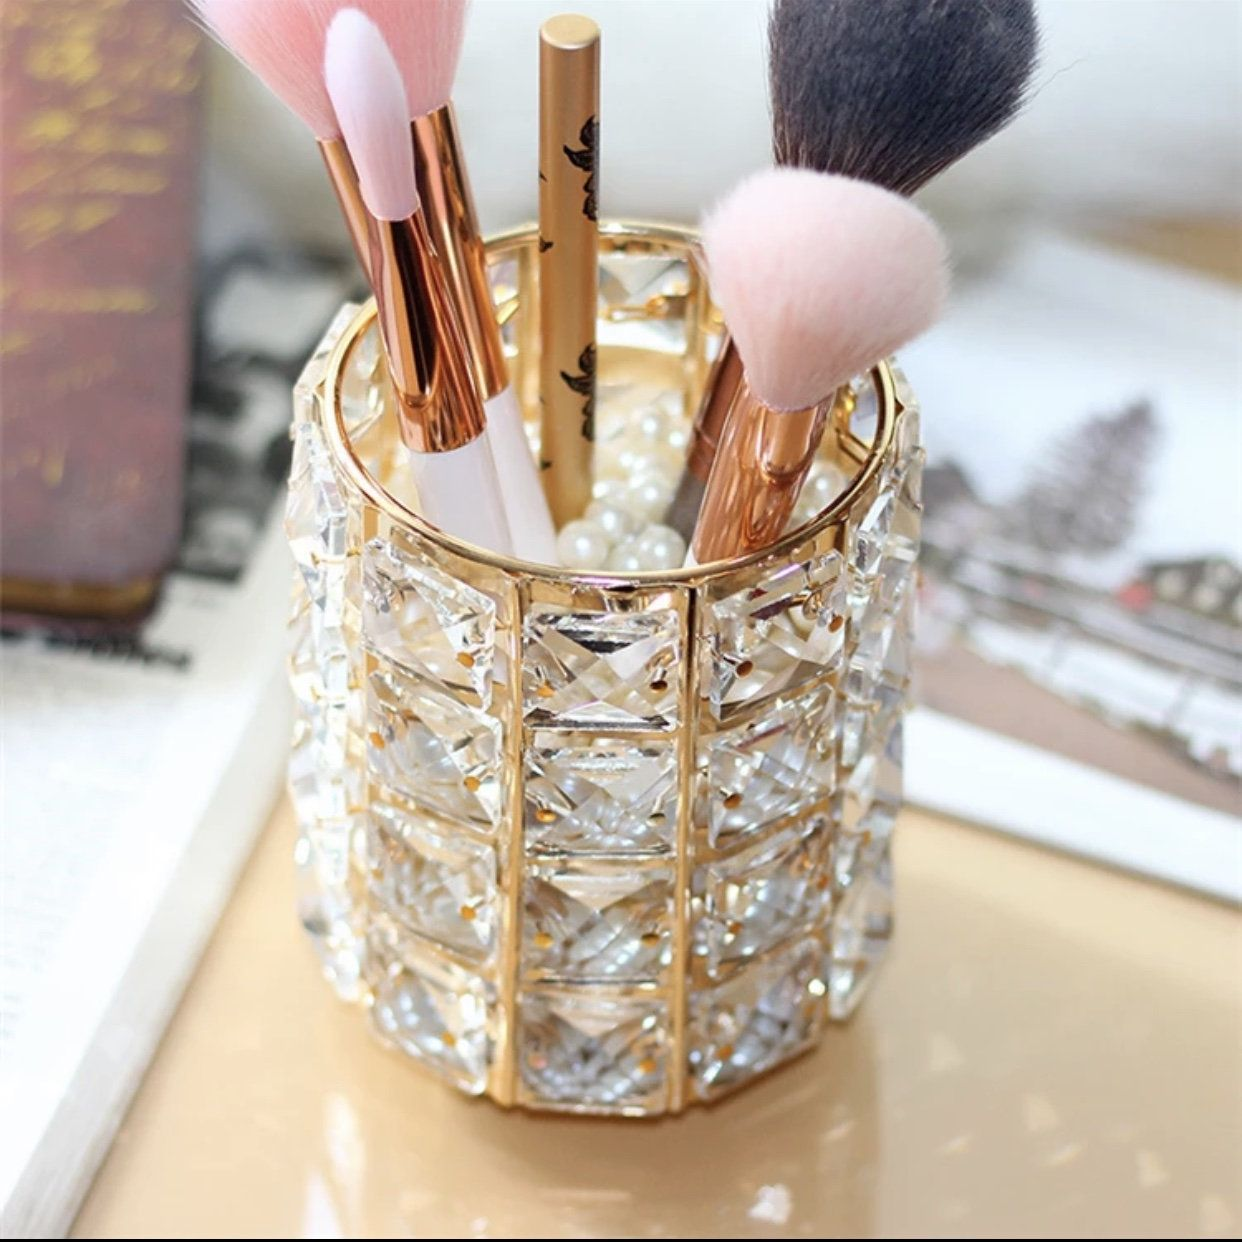 Crystal Makeup Brush Holder #MakeupBrushes #MakeupBrushHolder #CrystalBrushHolder